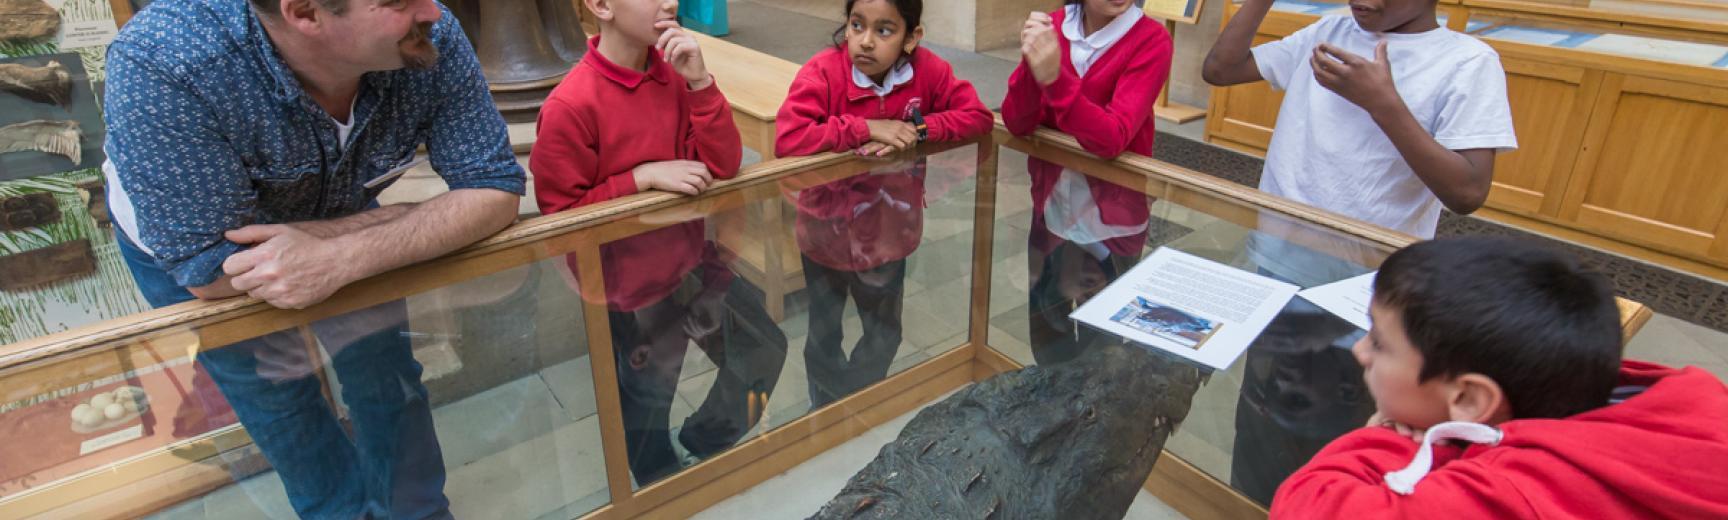 Primary school children learning